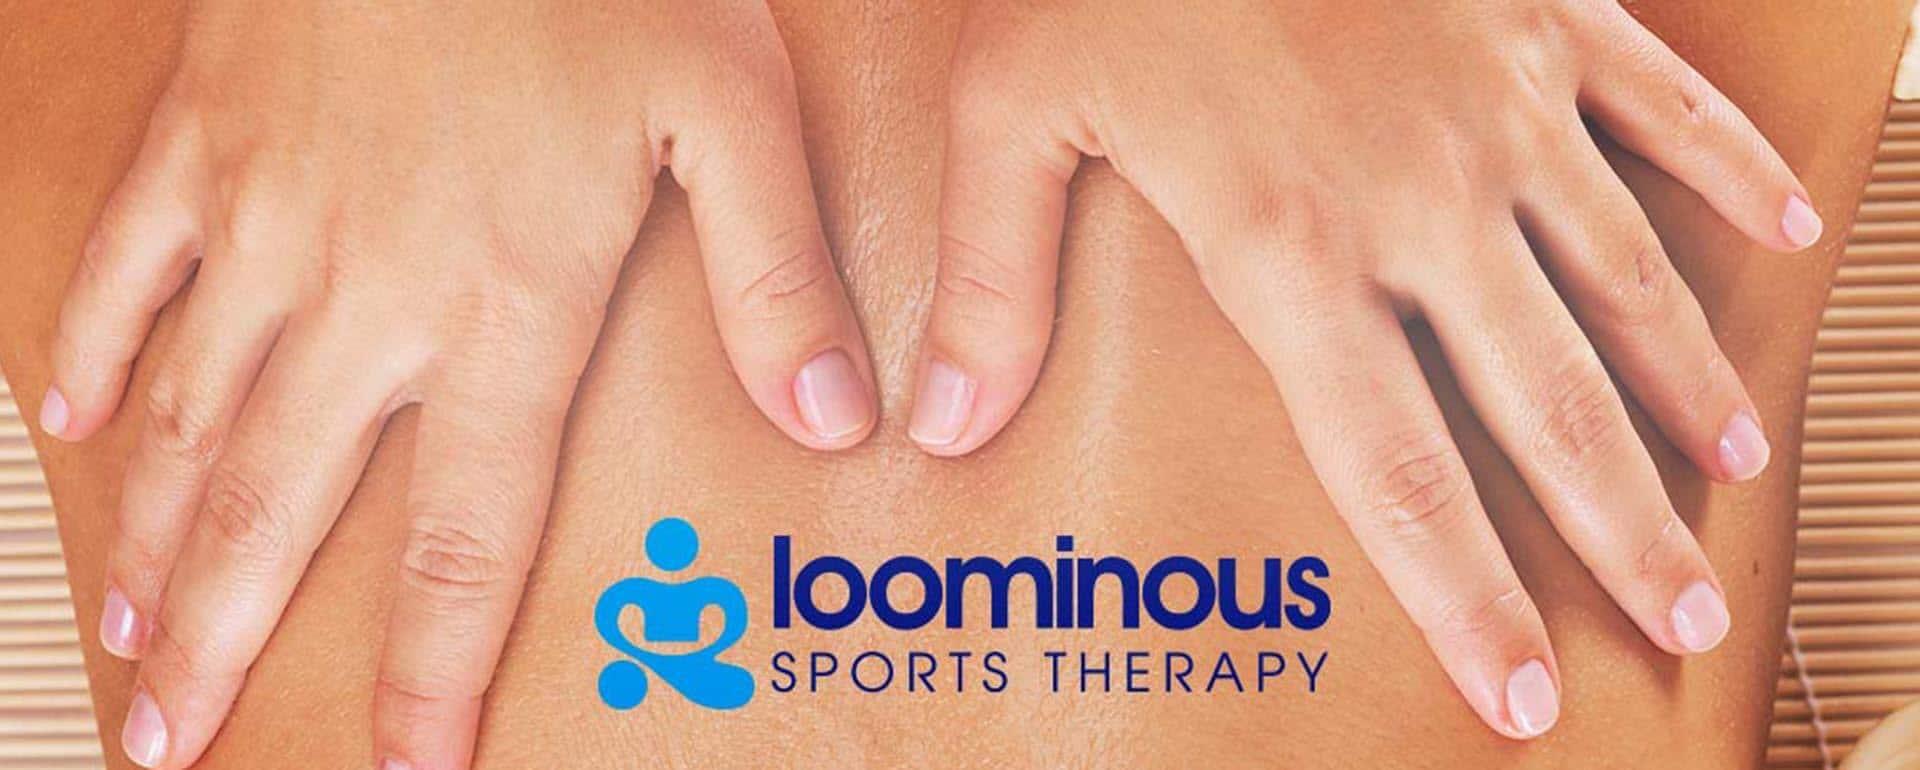 Loominous Logo Design and Website